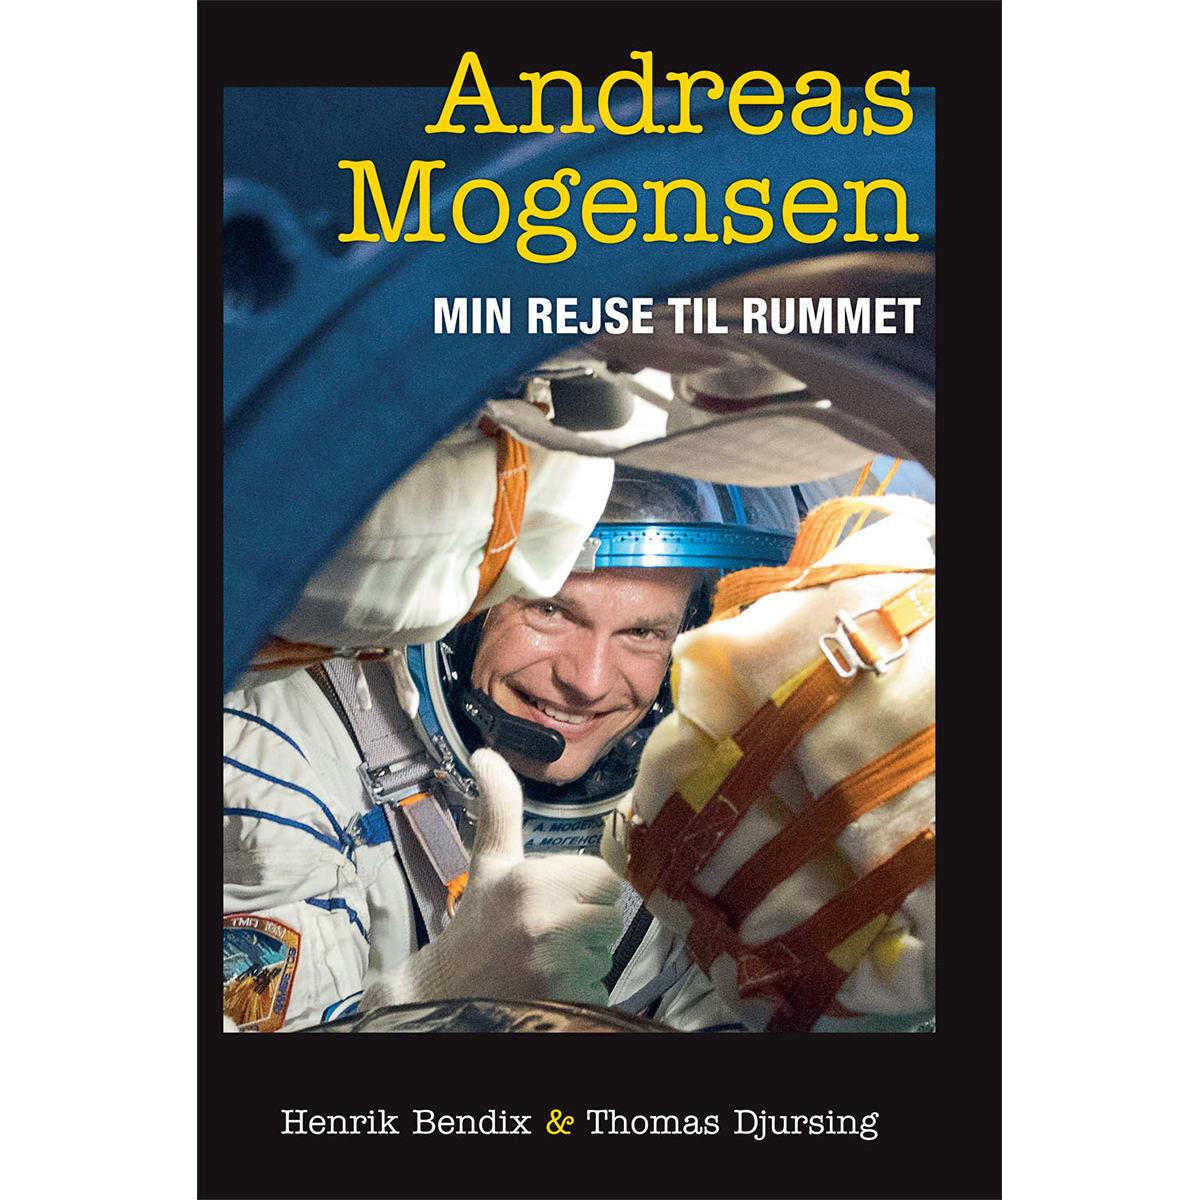 Af Andreas Mogensen, Henrik Bendix & Thomas Djursing